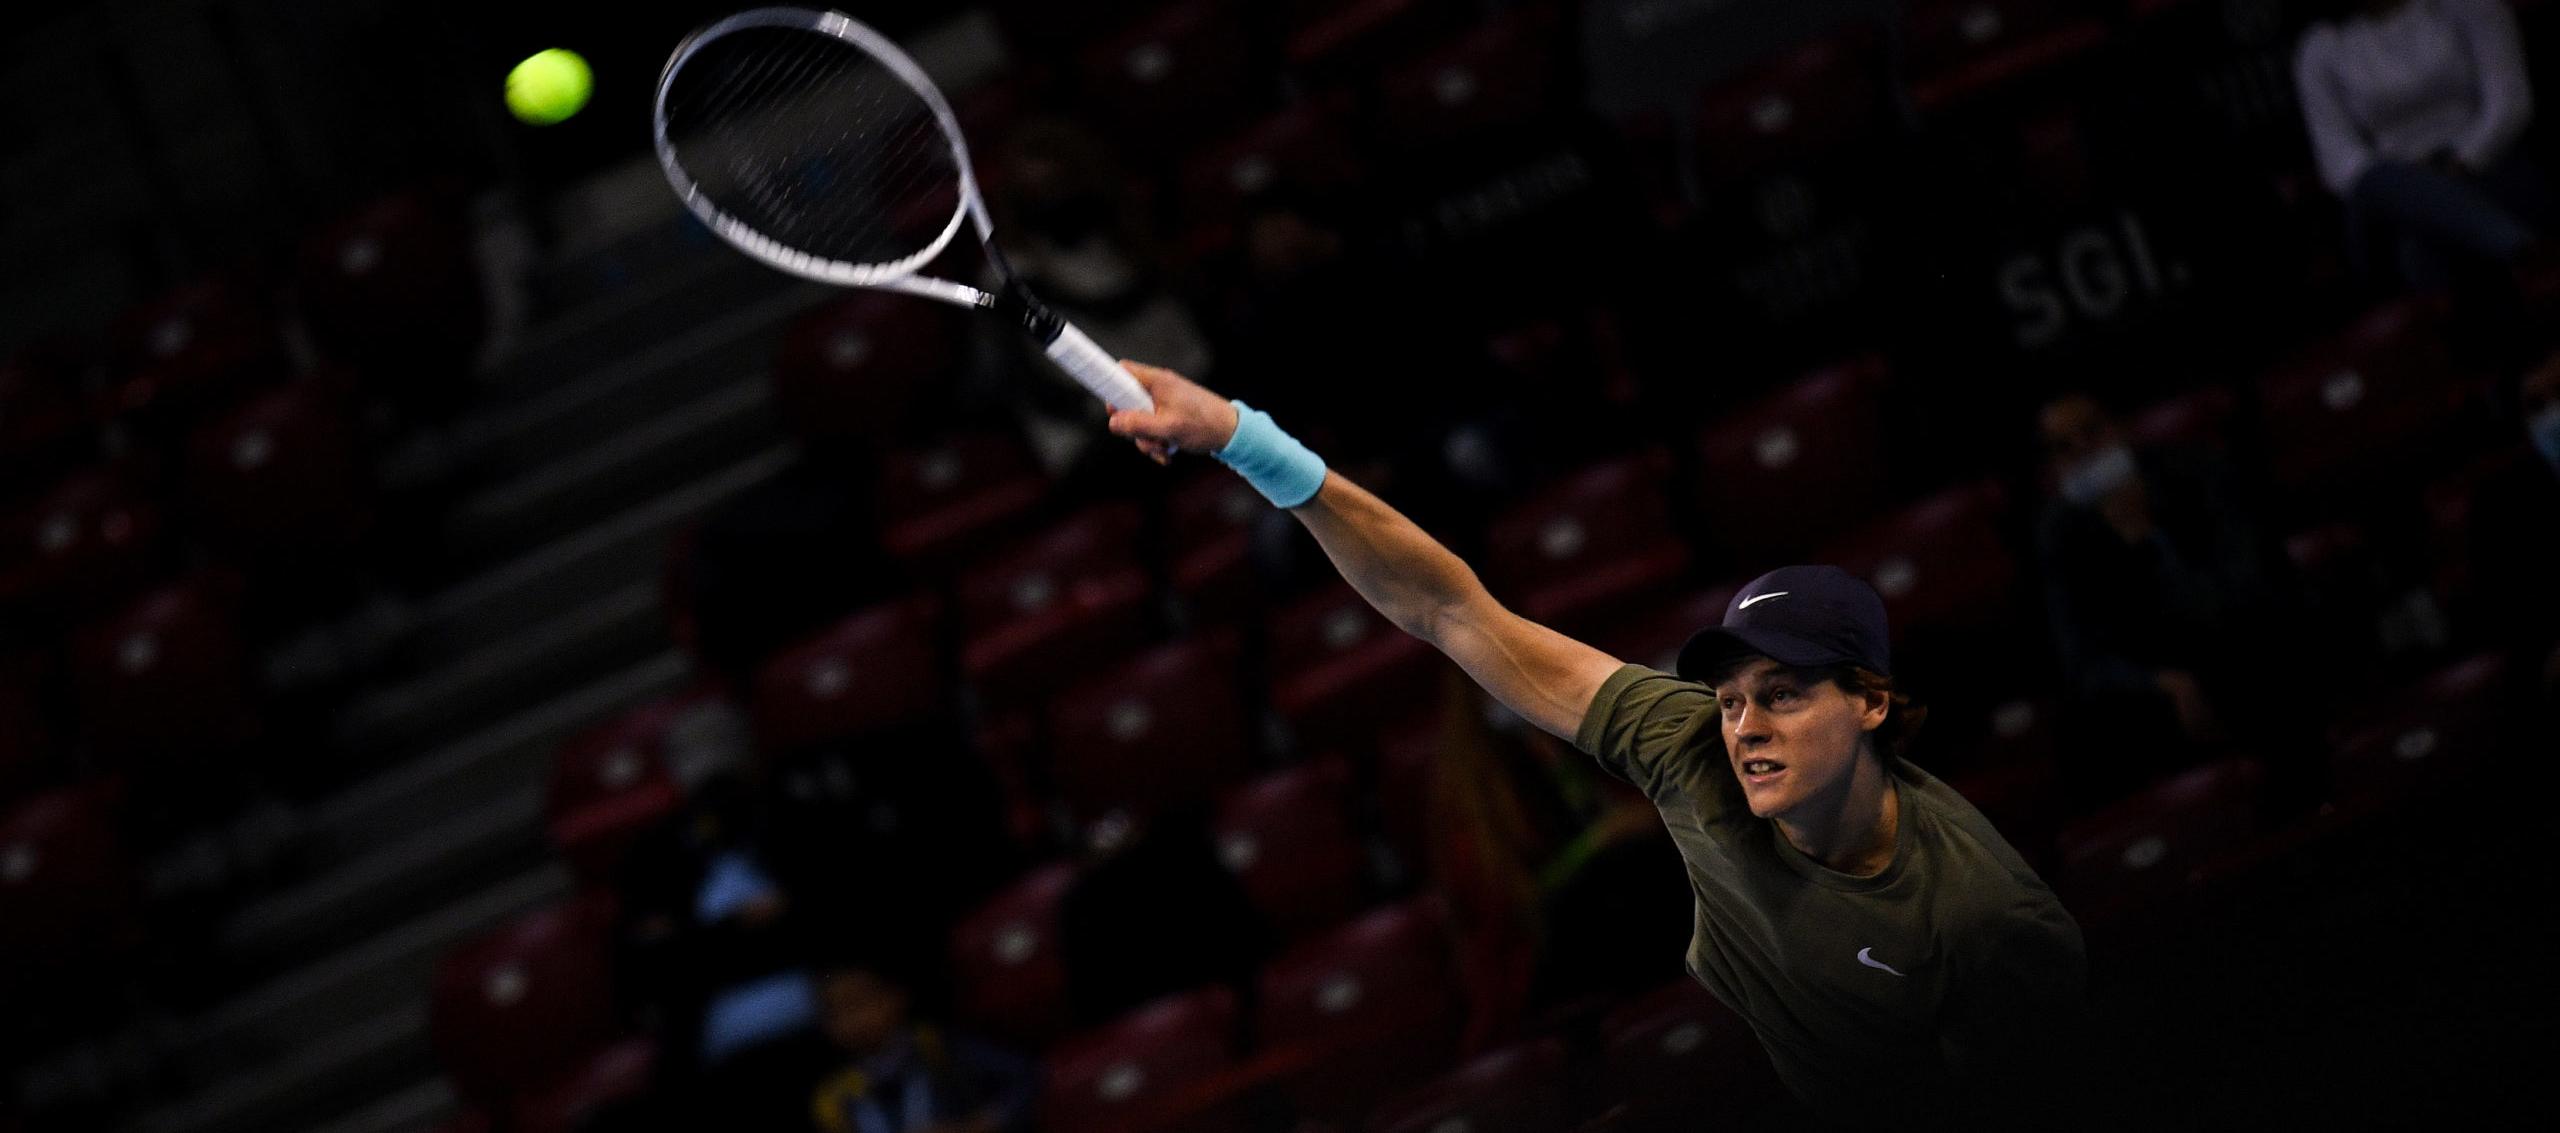 Jannik Sinner: cosa aspettarci dal 2021 del baby-fenomeno del tennis